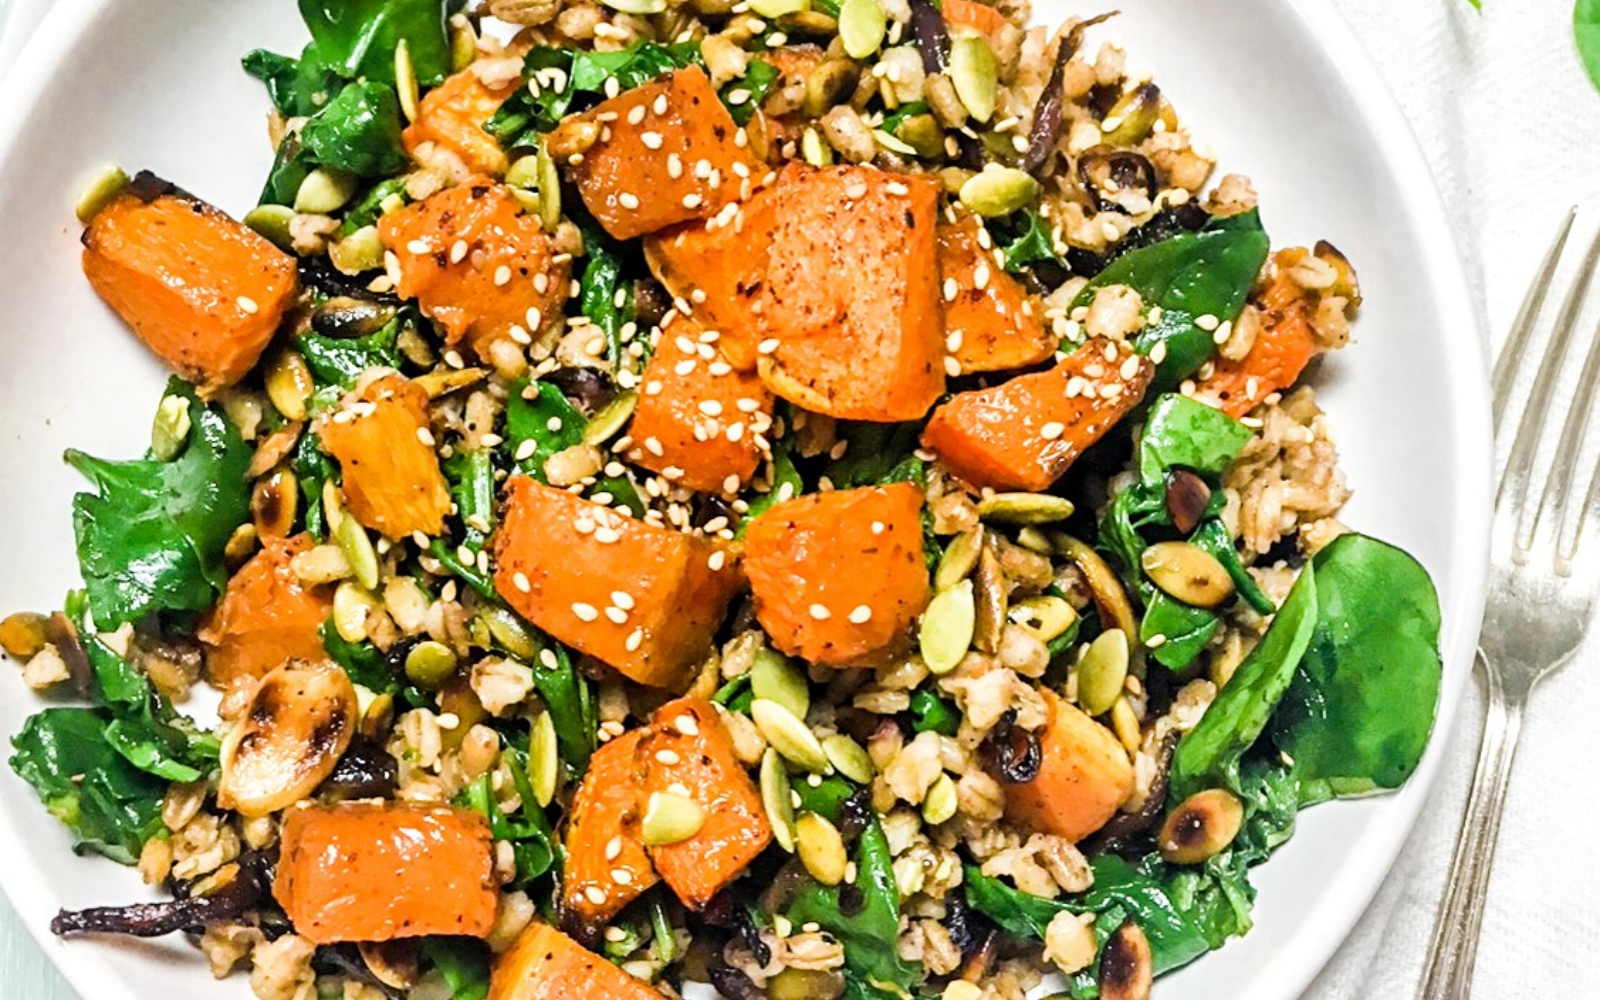 vegan roasted zaatar salad with tahini sauce